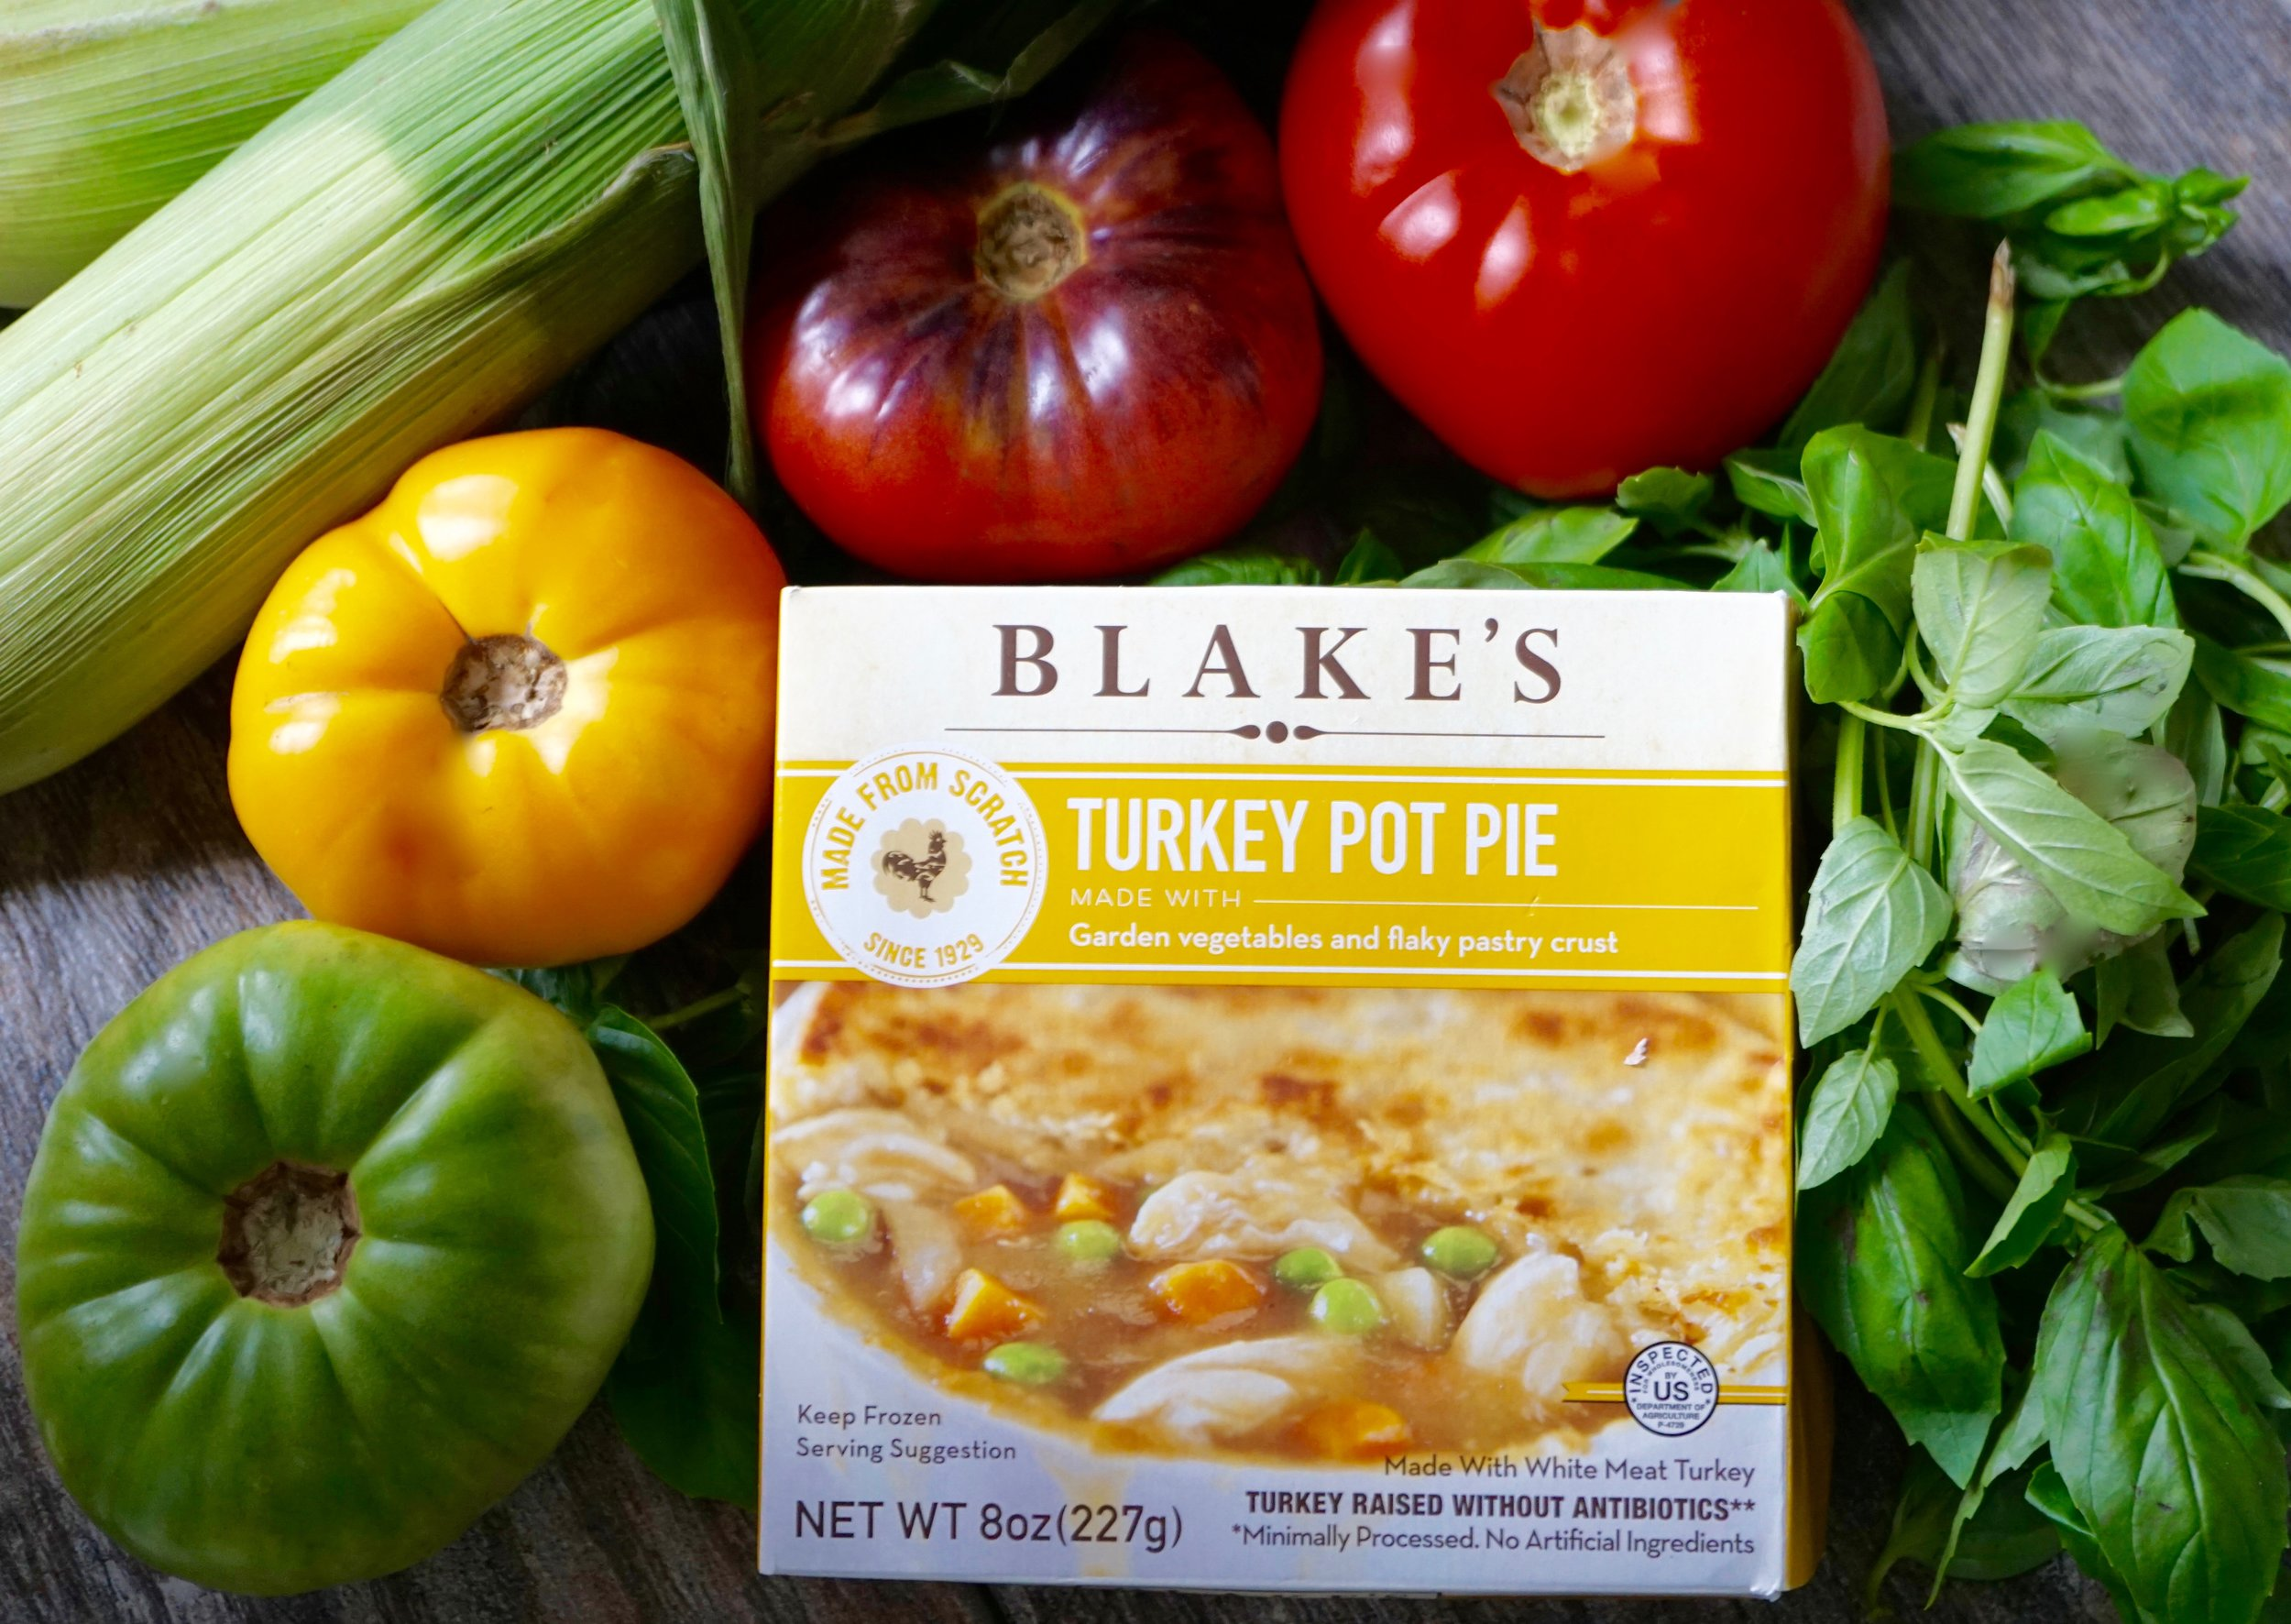 blakes-tomato-corn-salad potpie product dishitgirl.jpg